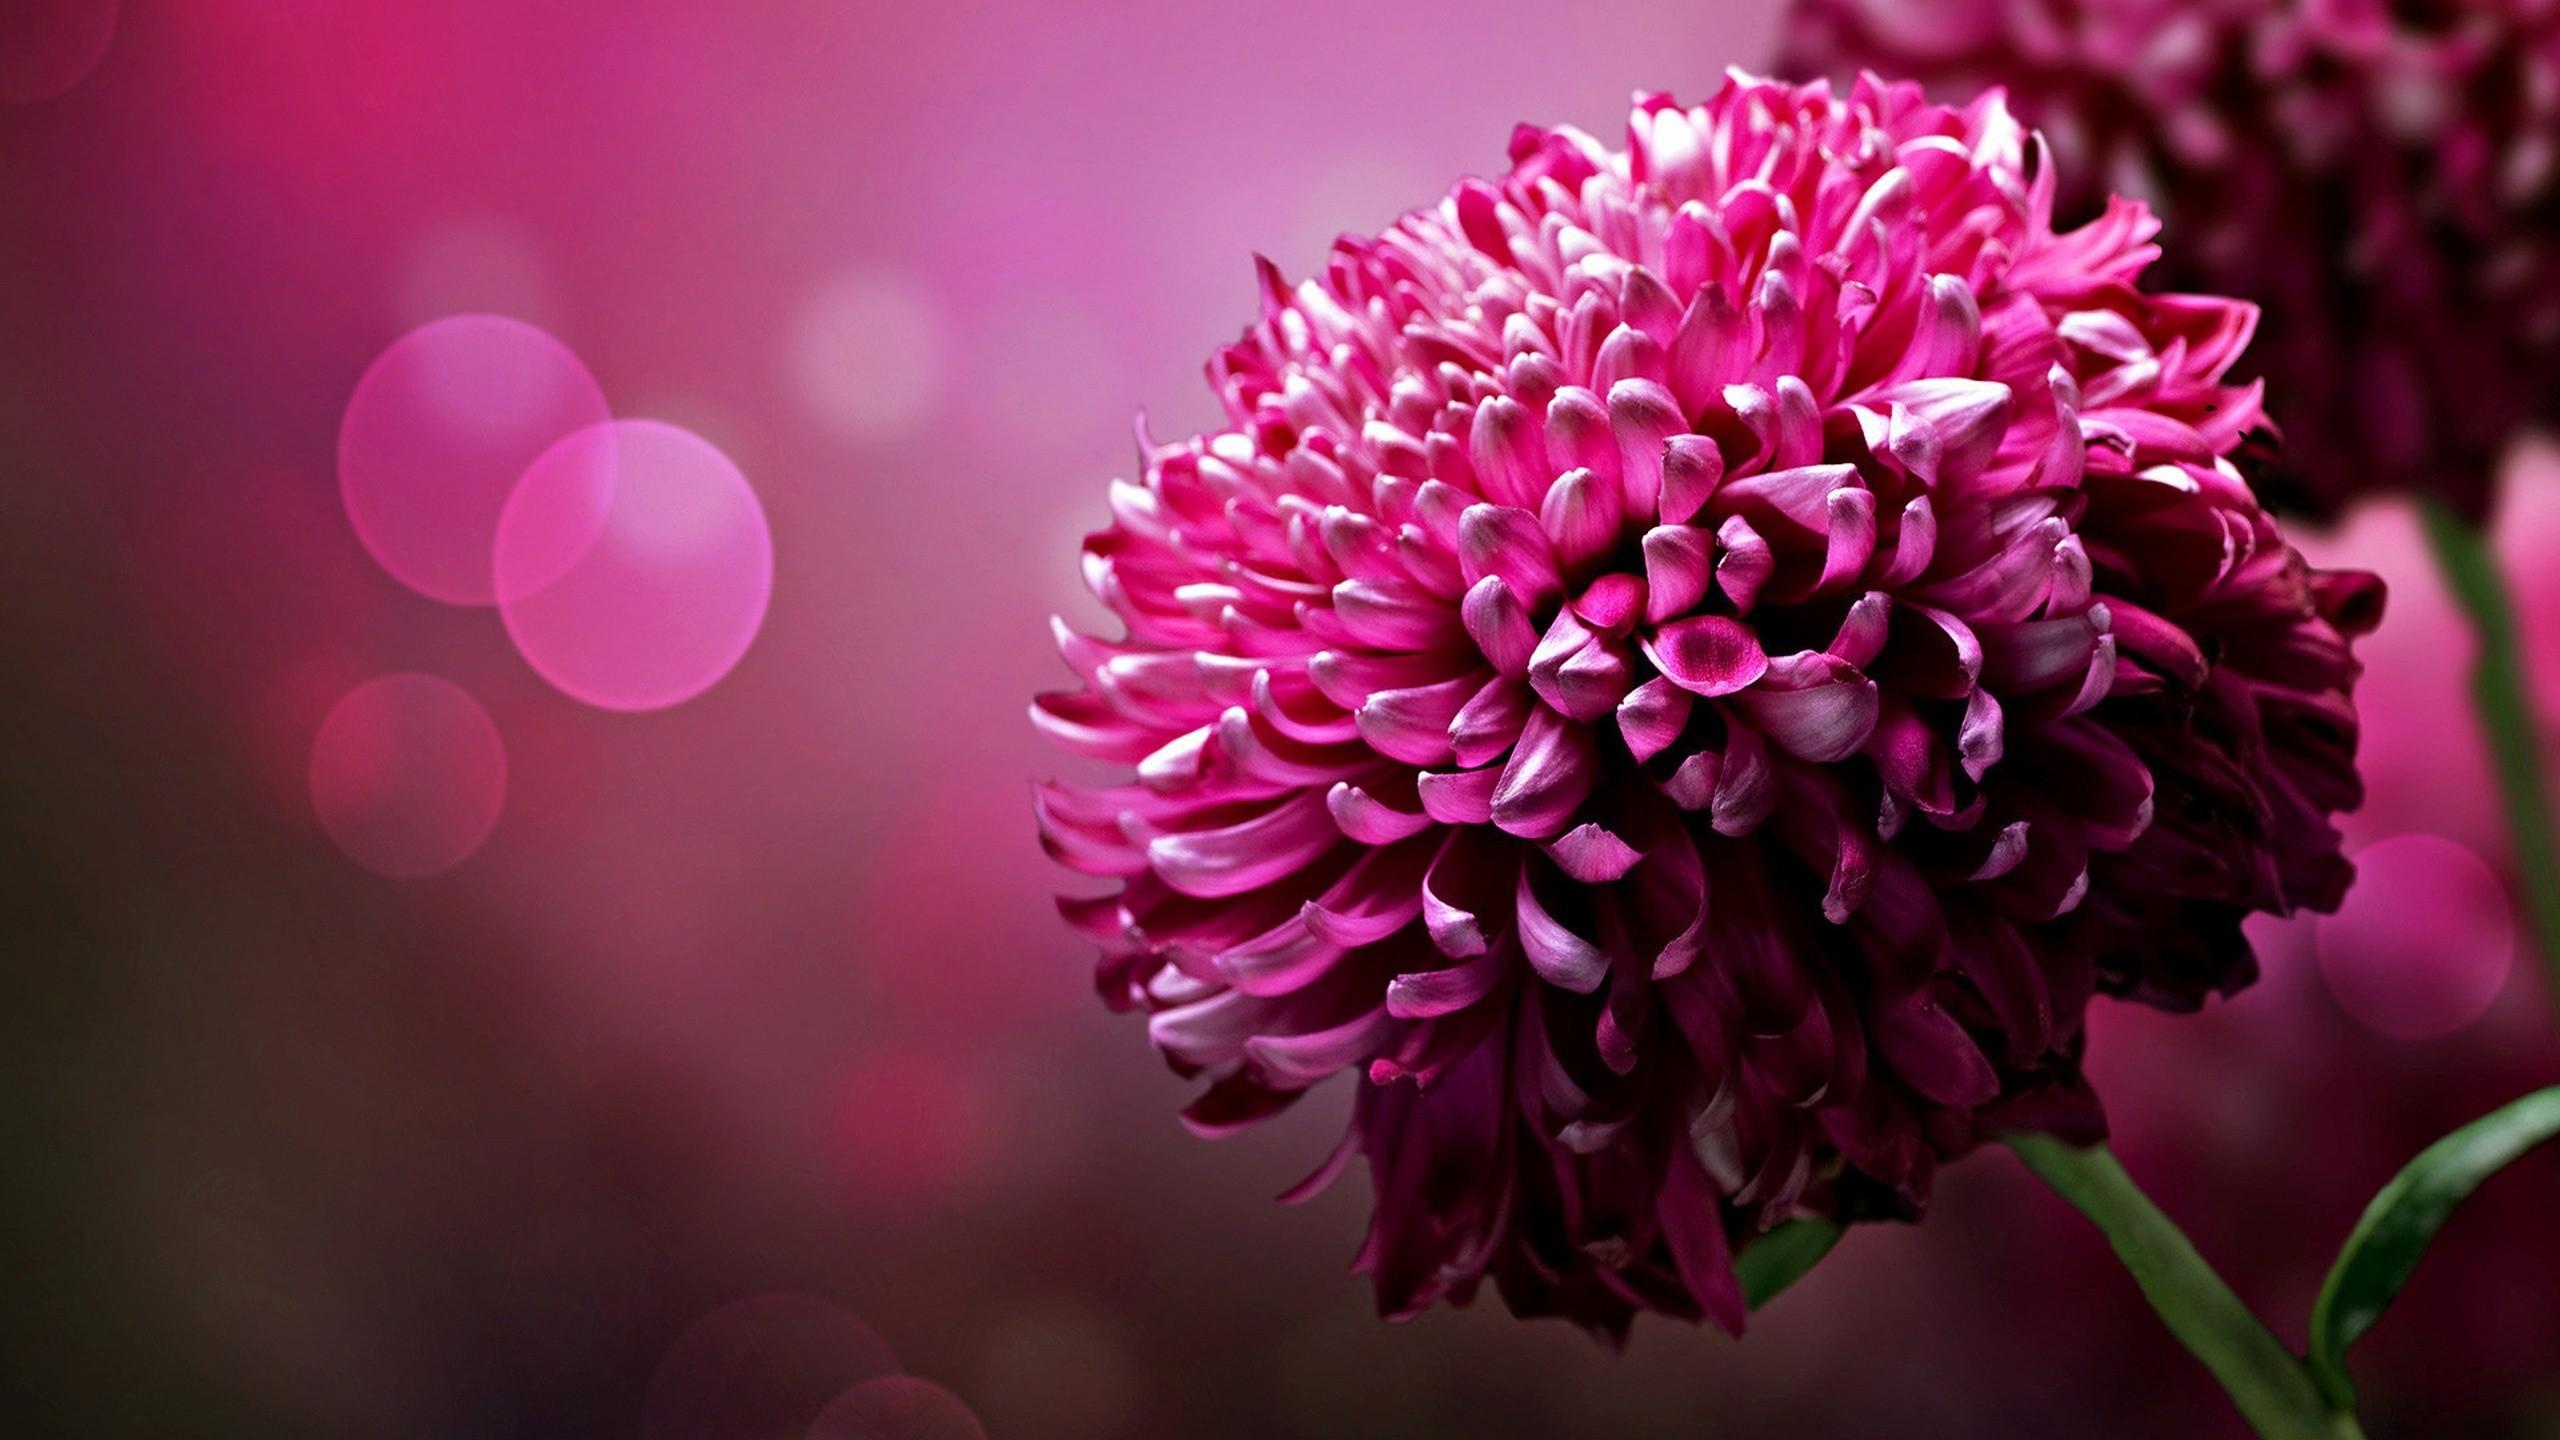 Pink Flowers HD Wallpapers – HD Wallpapers Inn